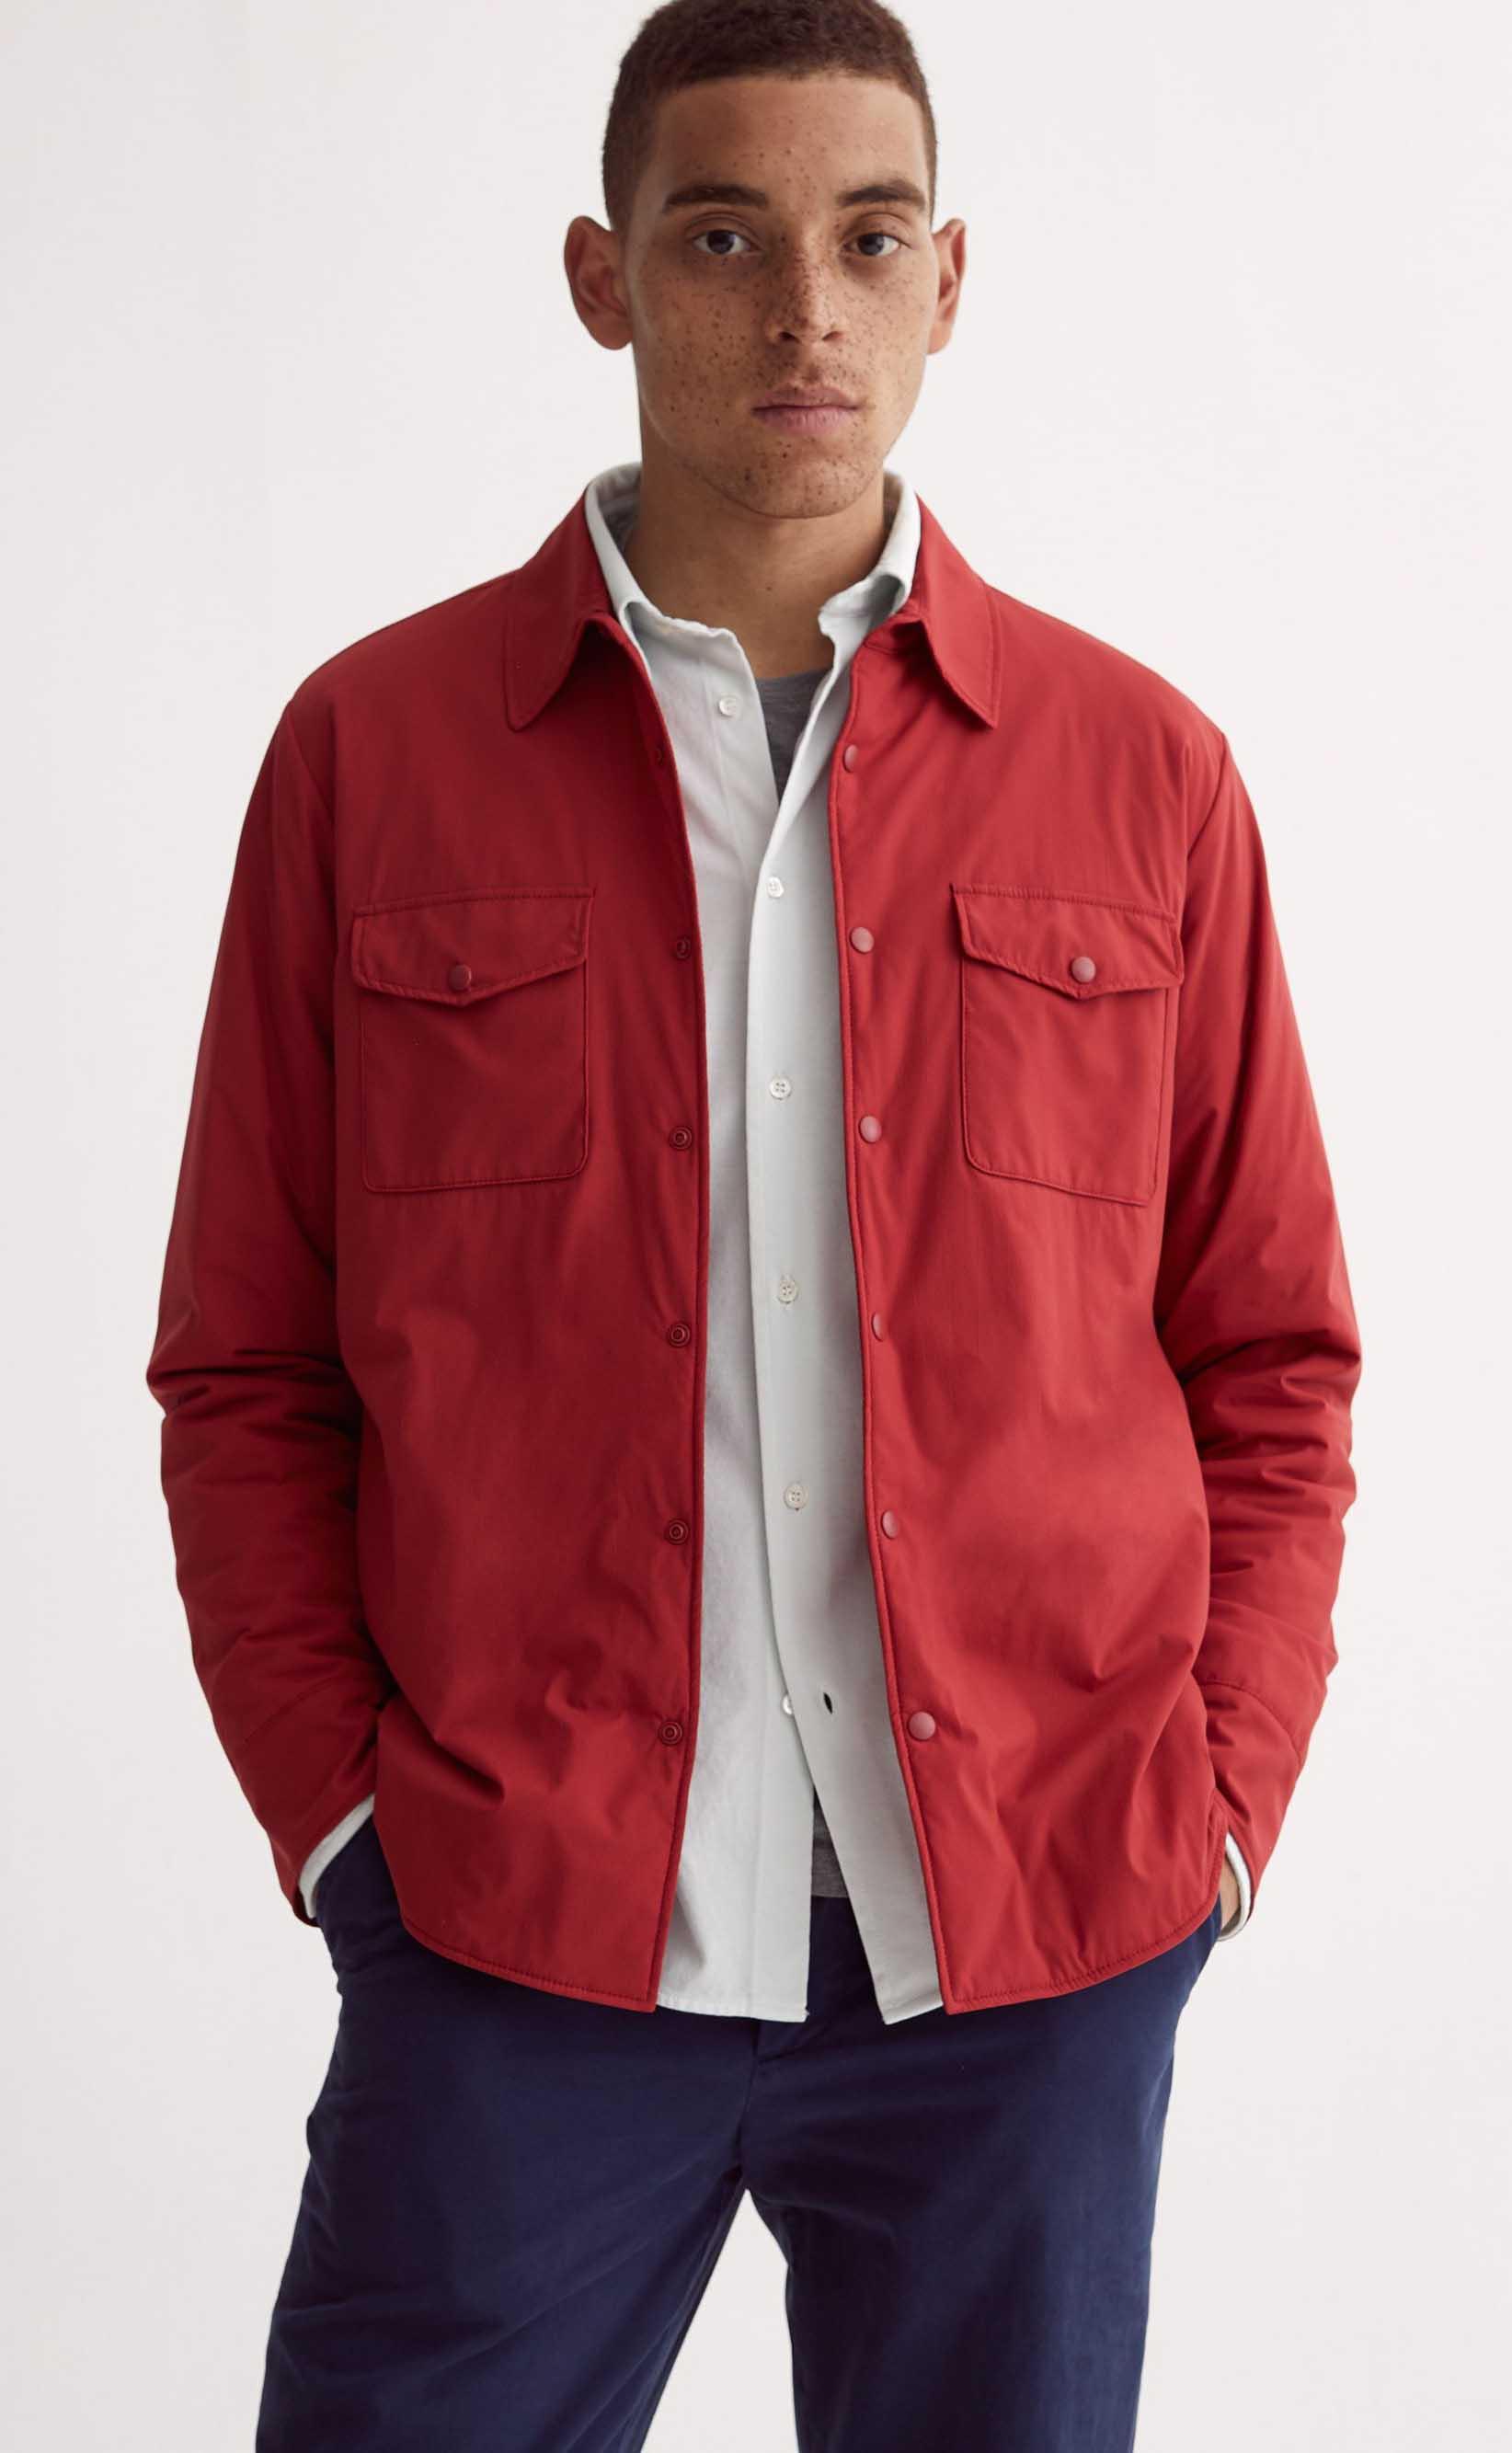 Rotes Jackenhemd von Aspesi